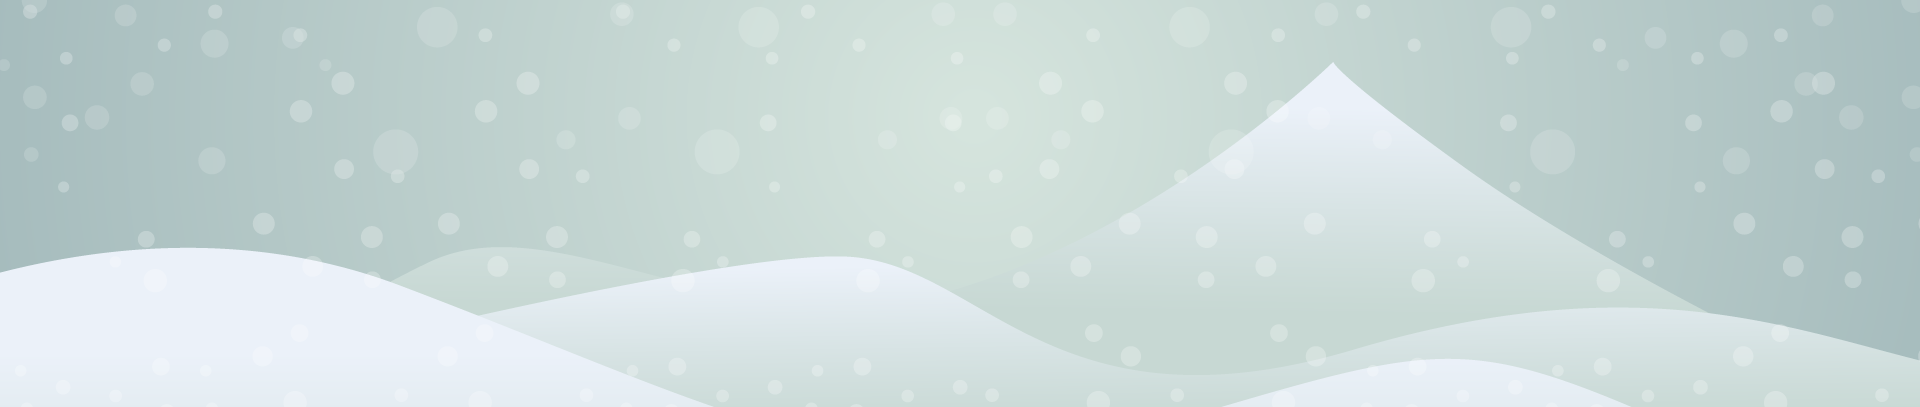 Advent 2019 – PROGRAM DOGAĐANJA